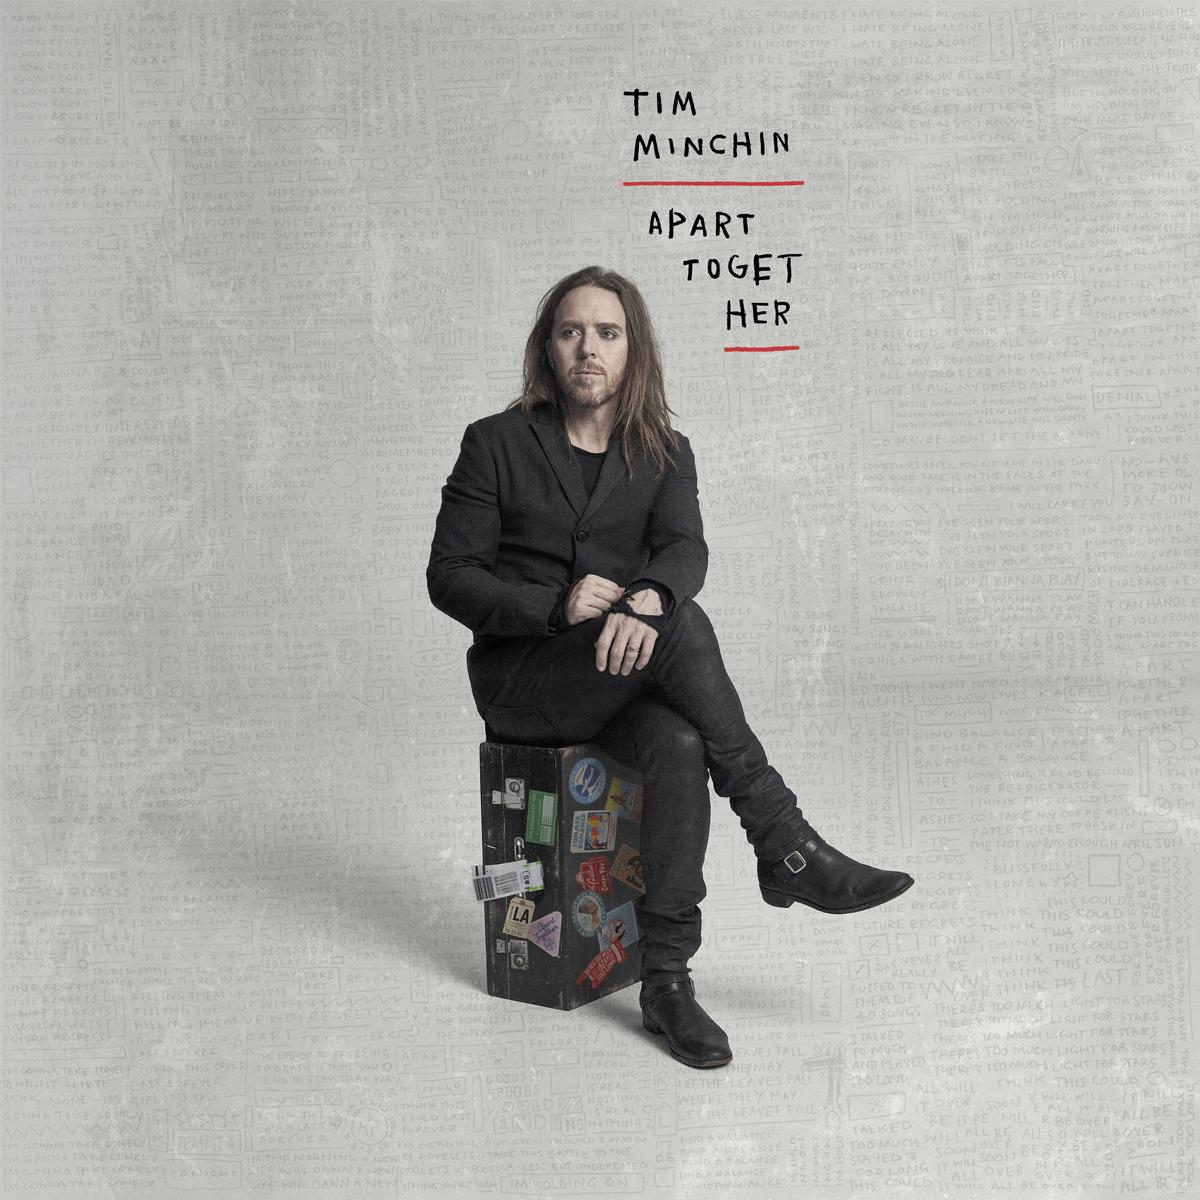 Tim Minchin new album Apart Together